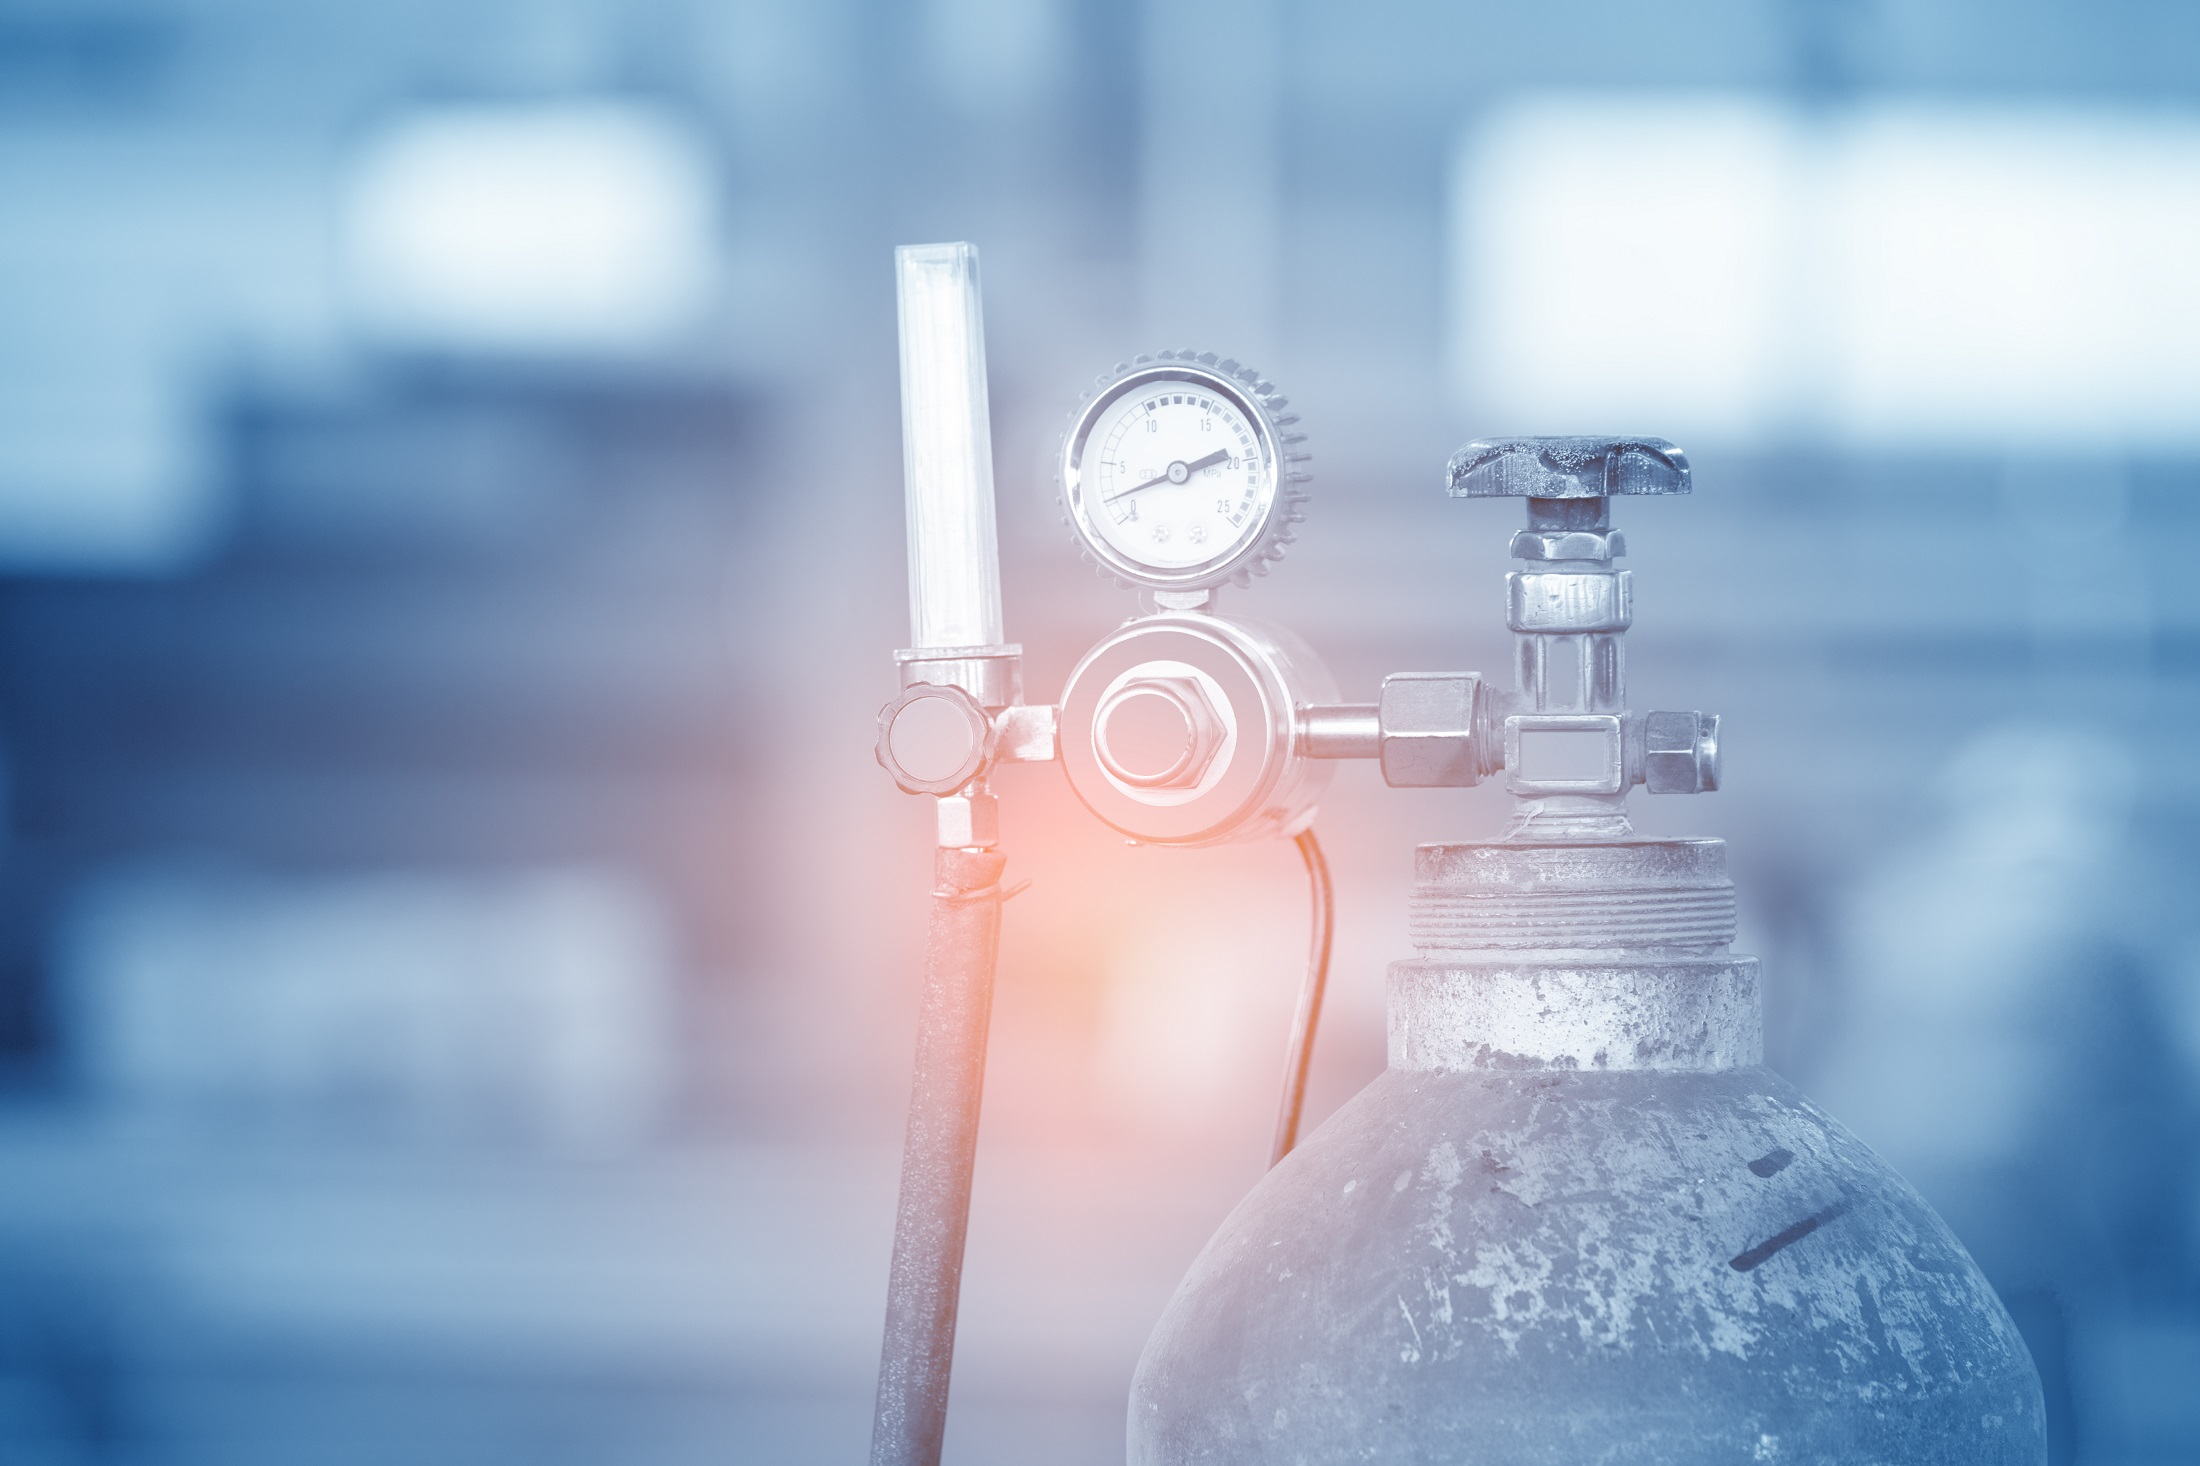 Mandatory Signage for Gas Cylinder Stores